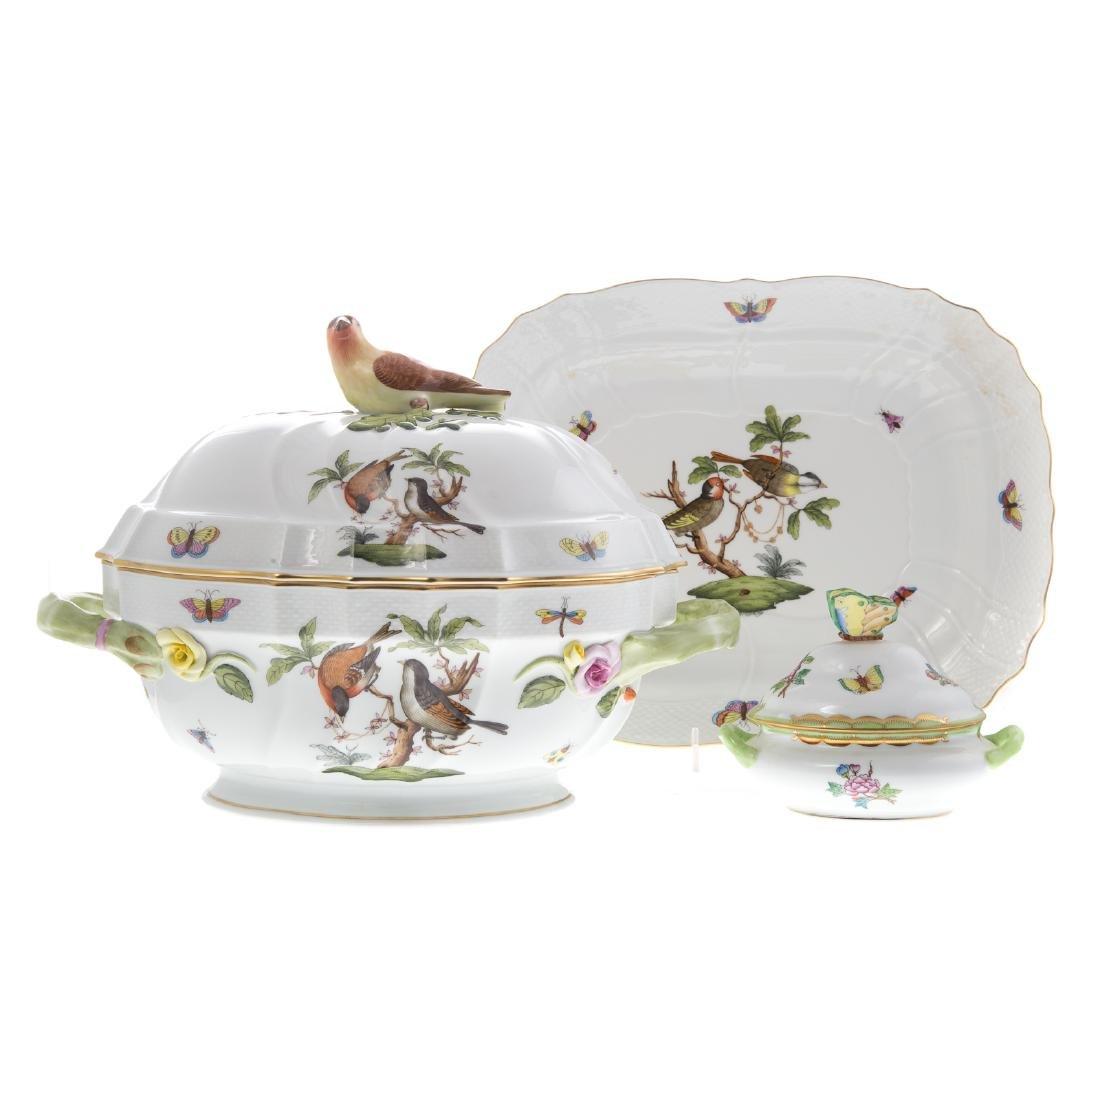 Herend Rothschild Bird soup tureen and platter